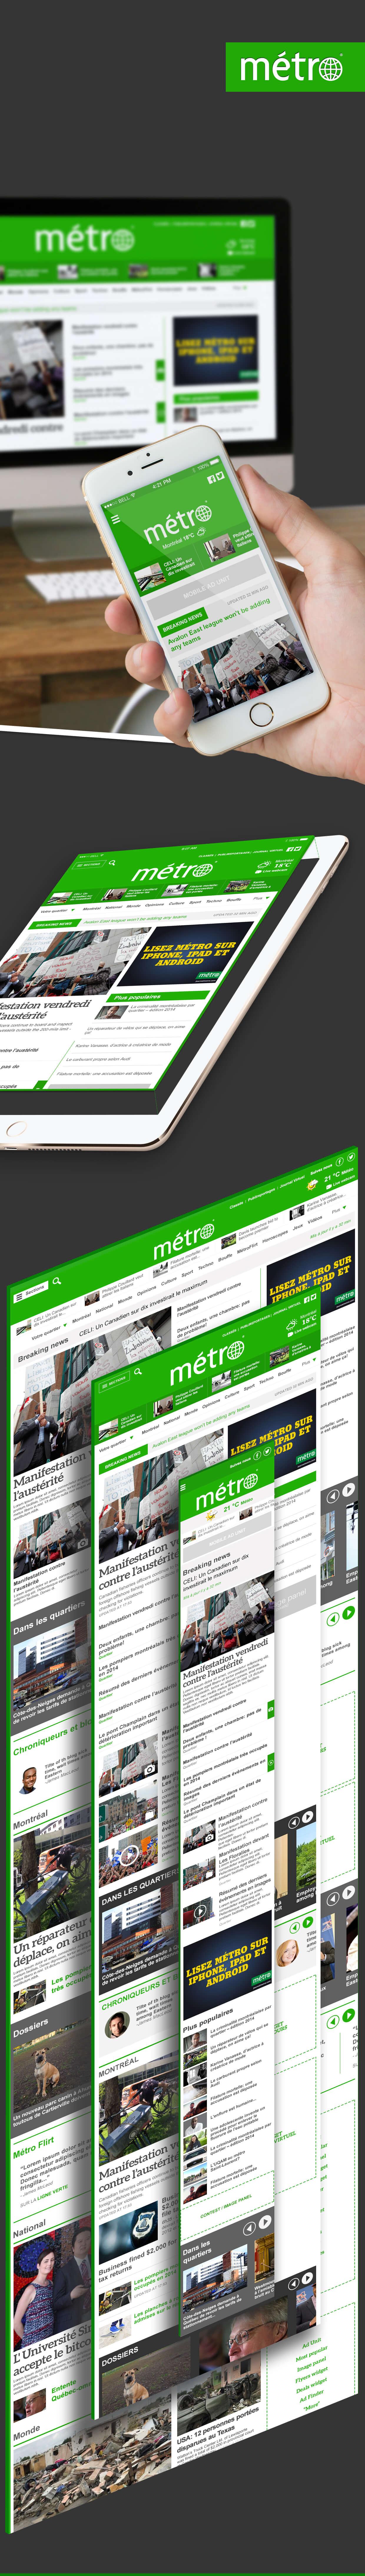 metro-mockups